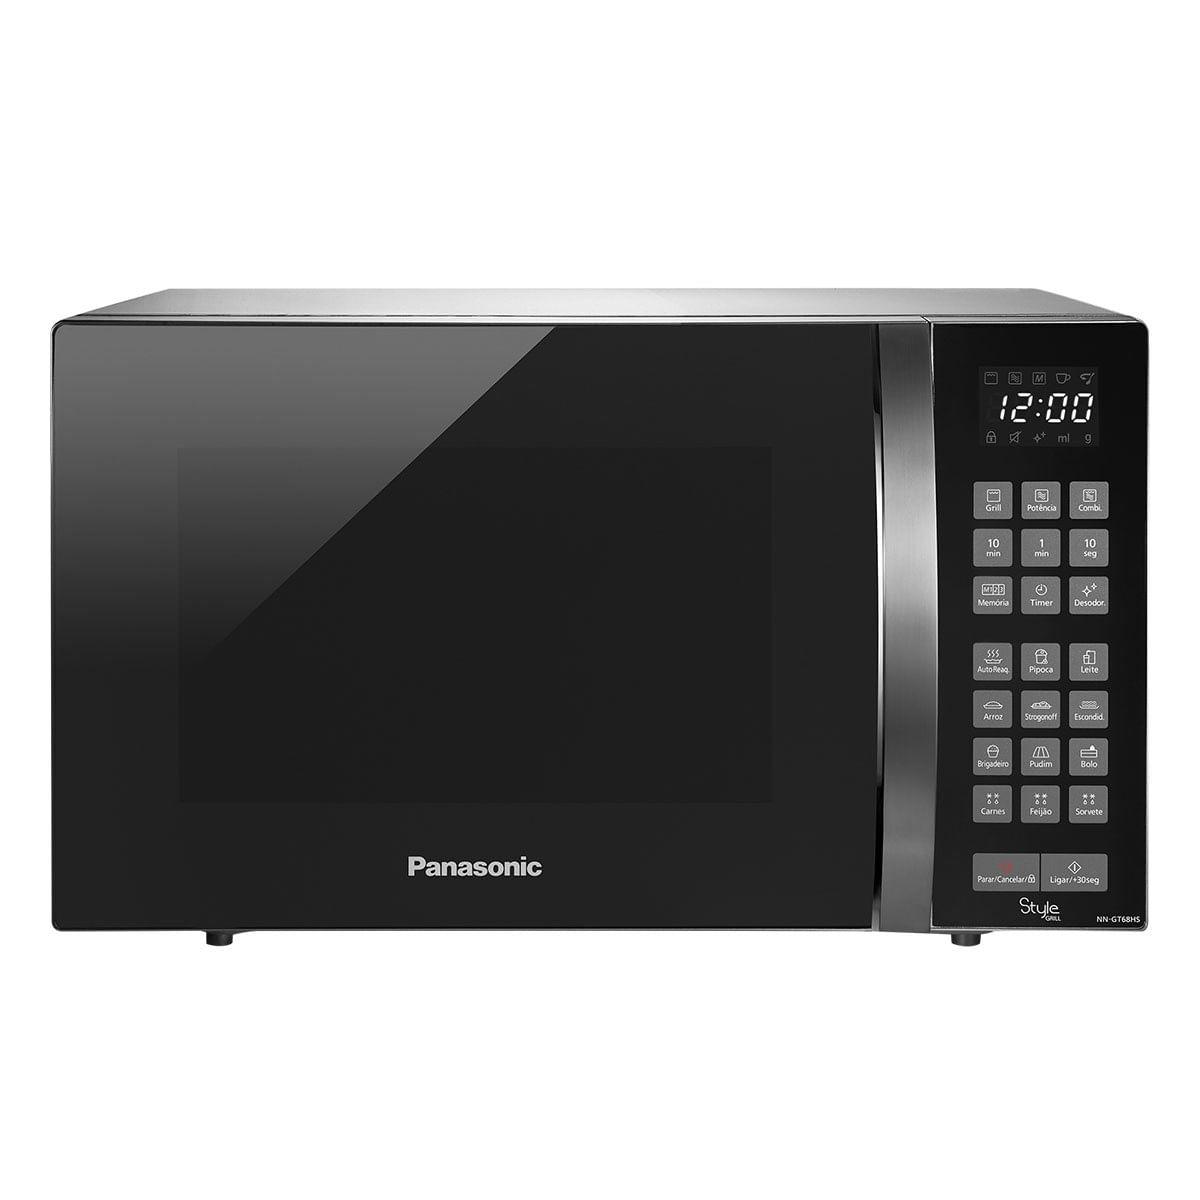 Micro-ondas Panasonic Style Grill 30L Timer Inox 220V NN-GT68HSRUK